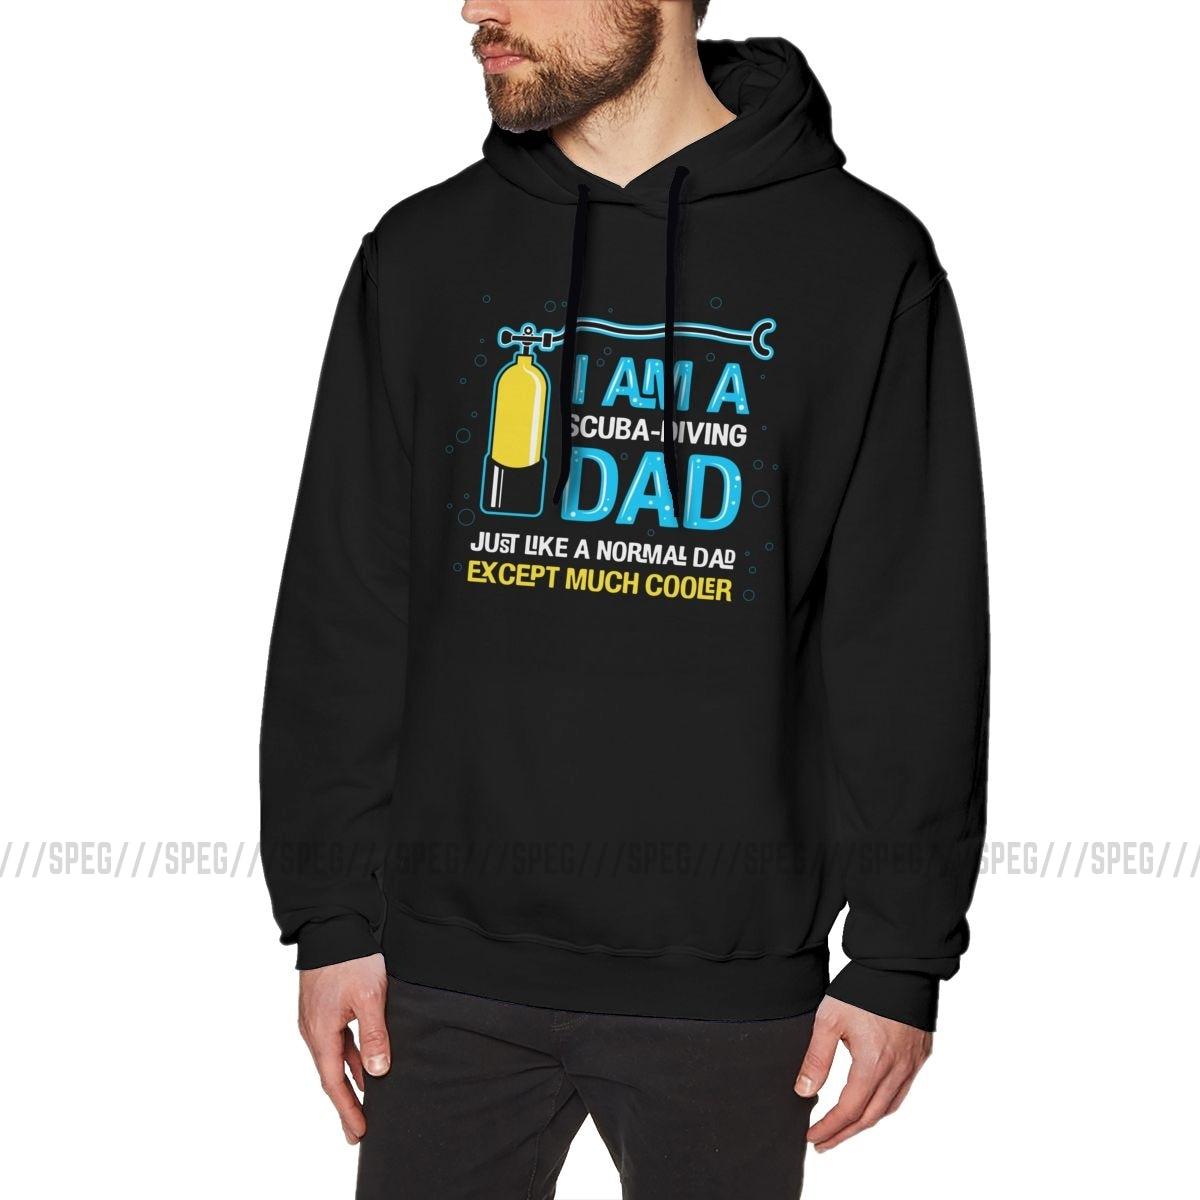 Image 2 - Mens Sweatshirt Im A Scuba Dive Dad 100% Cotton Gift Novelty Hoodies PulloversHoodies